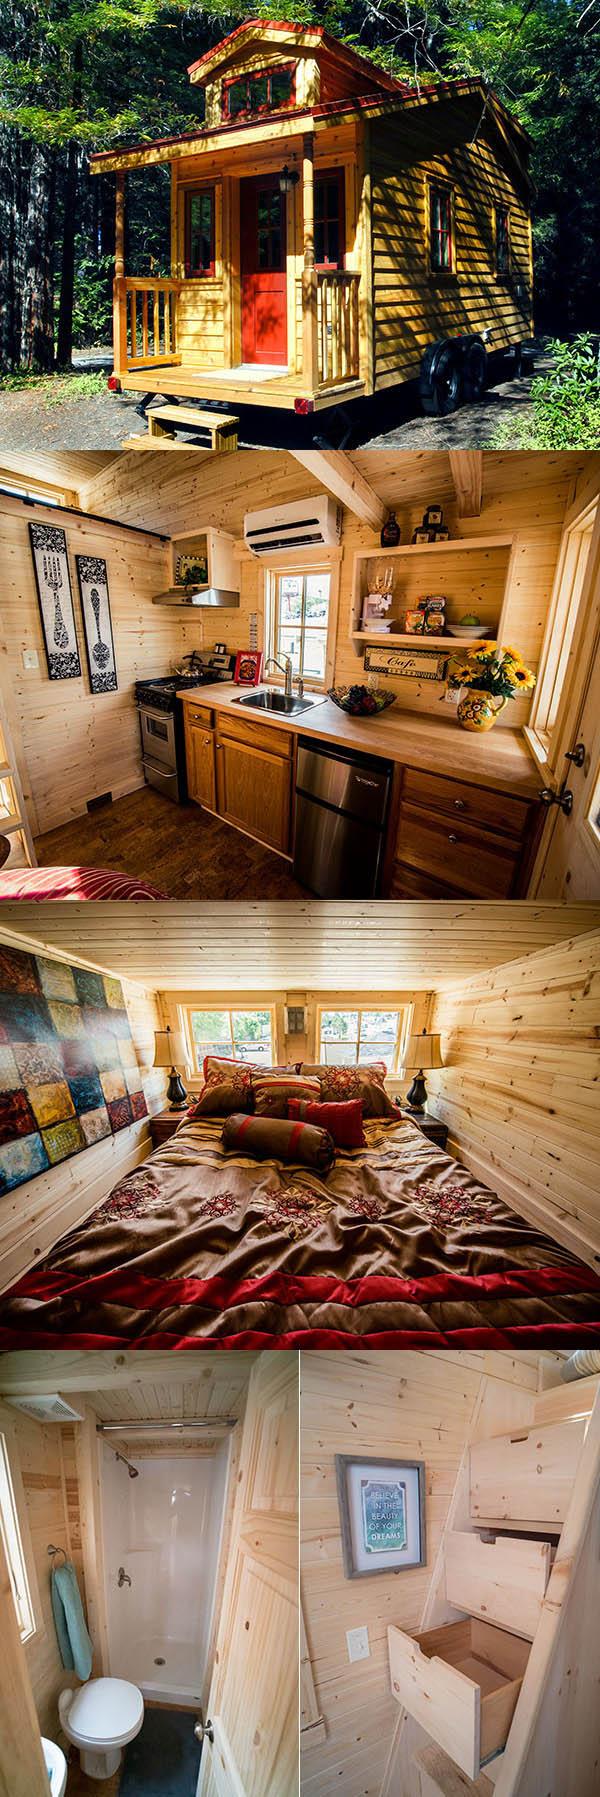 Terra Sophia - Tinny house - Maison minuscule déplaçable